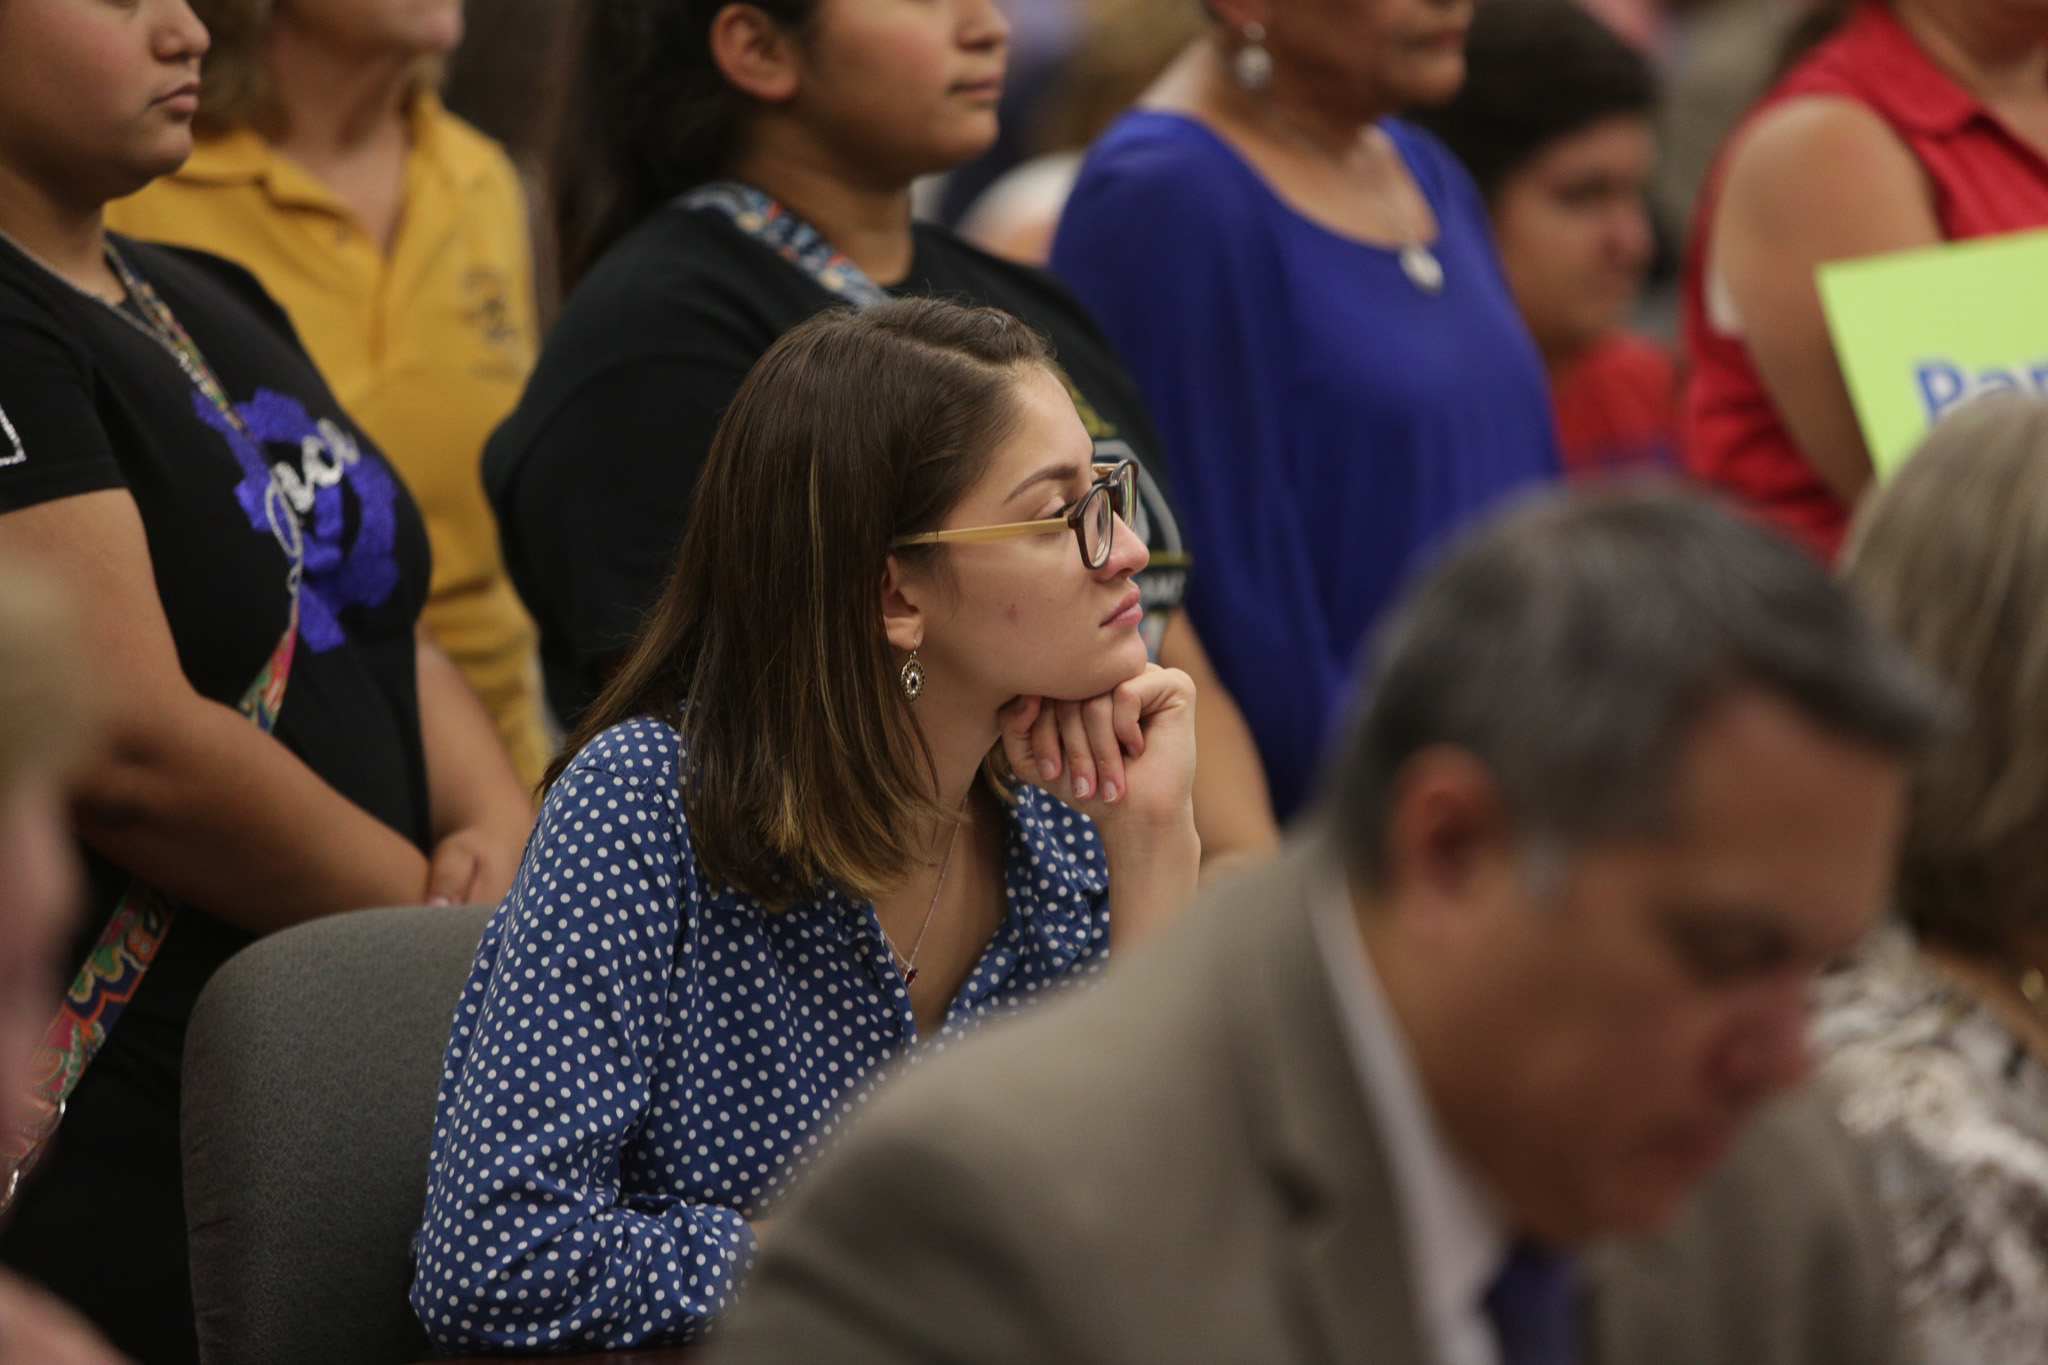 Ruby Palanco at the SAISD Board Meeting on Monday evening.